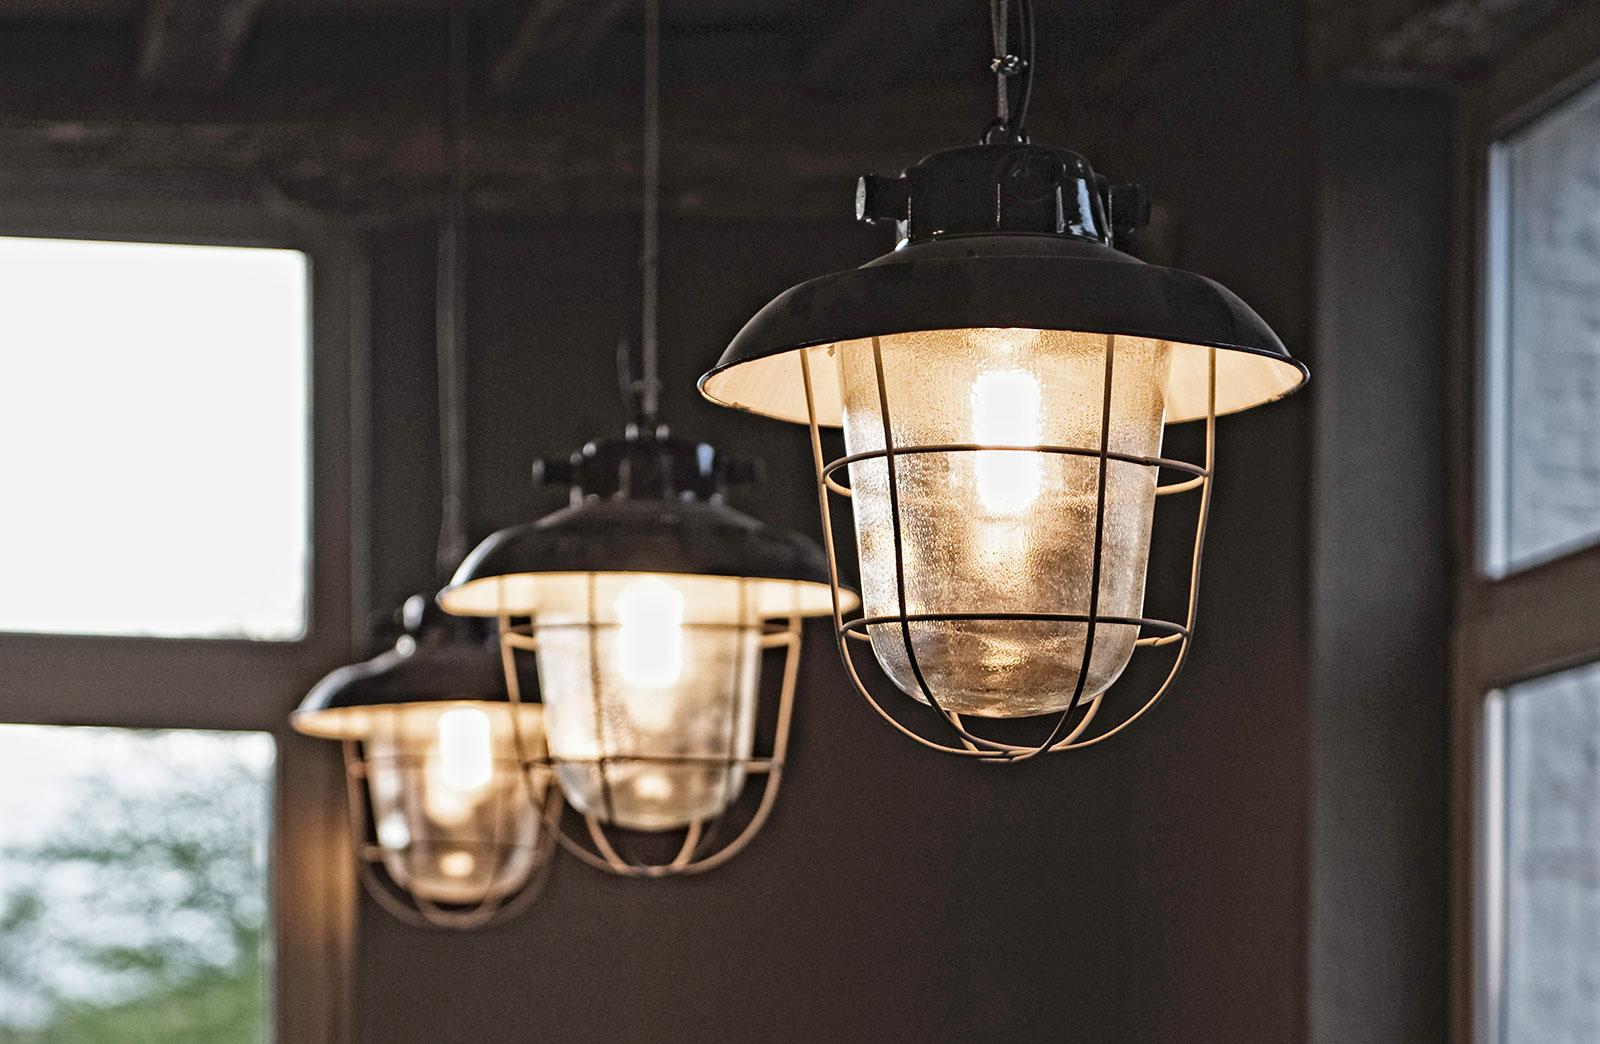 Oude Industriele Lampen : Industriele lampen in de keuken full size of modern interieur